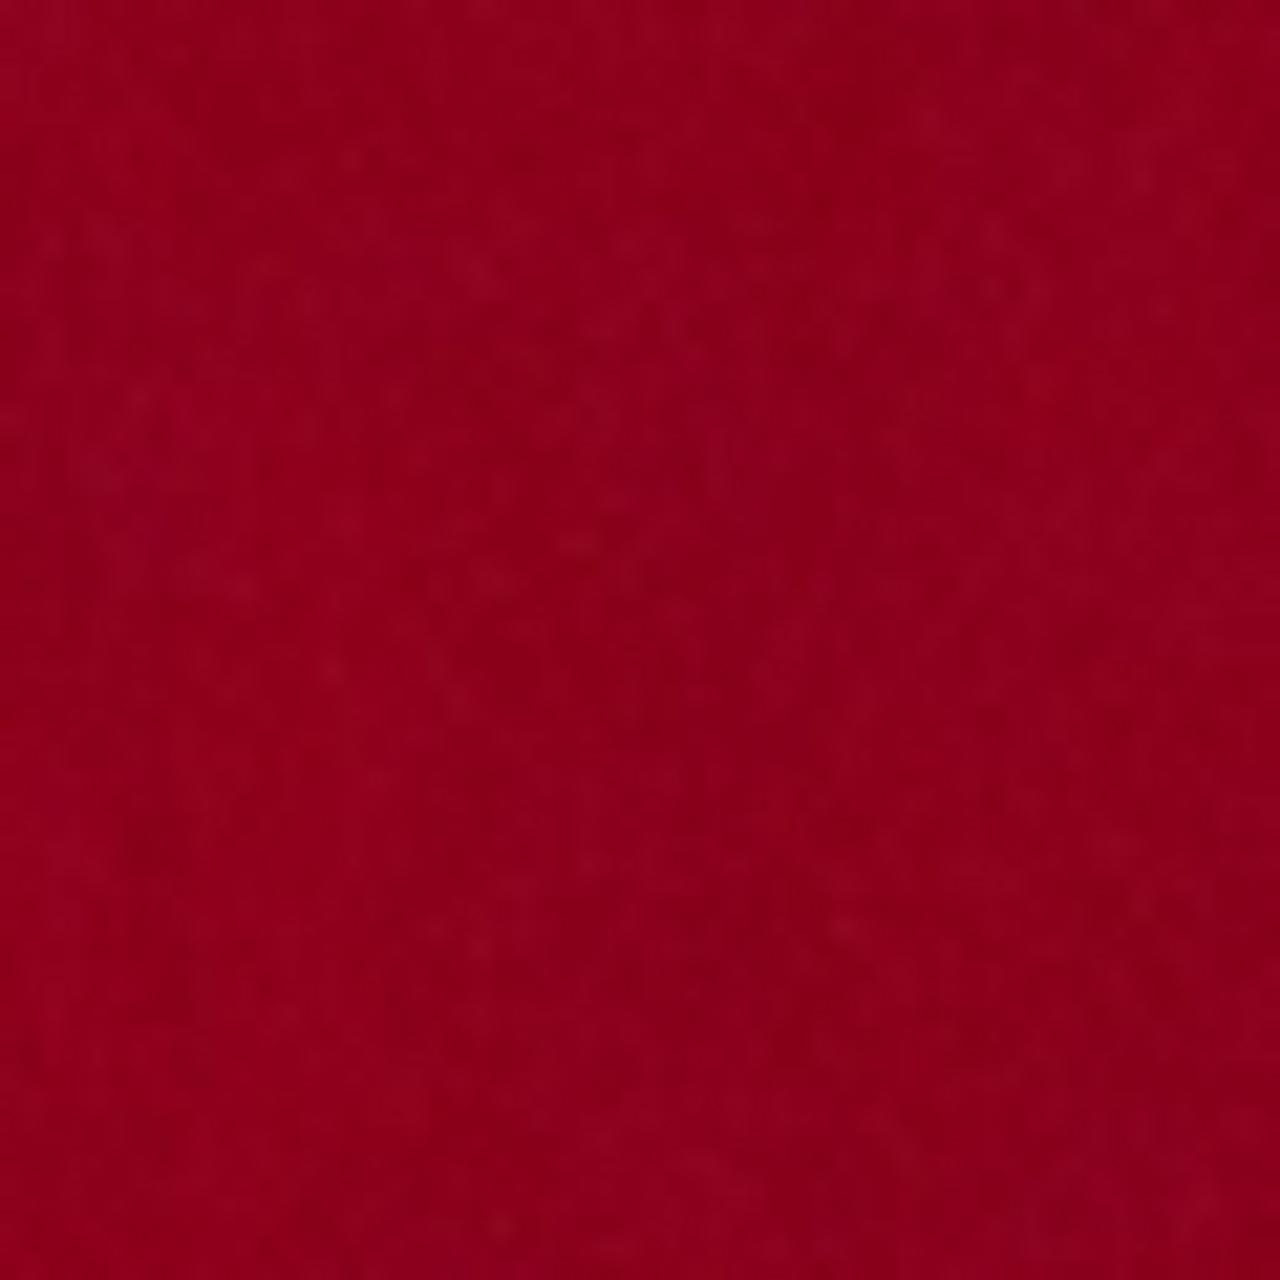 Deep Rose Red #7 - Grateful Dyes, Inc.